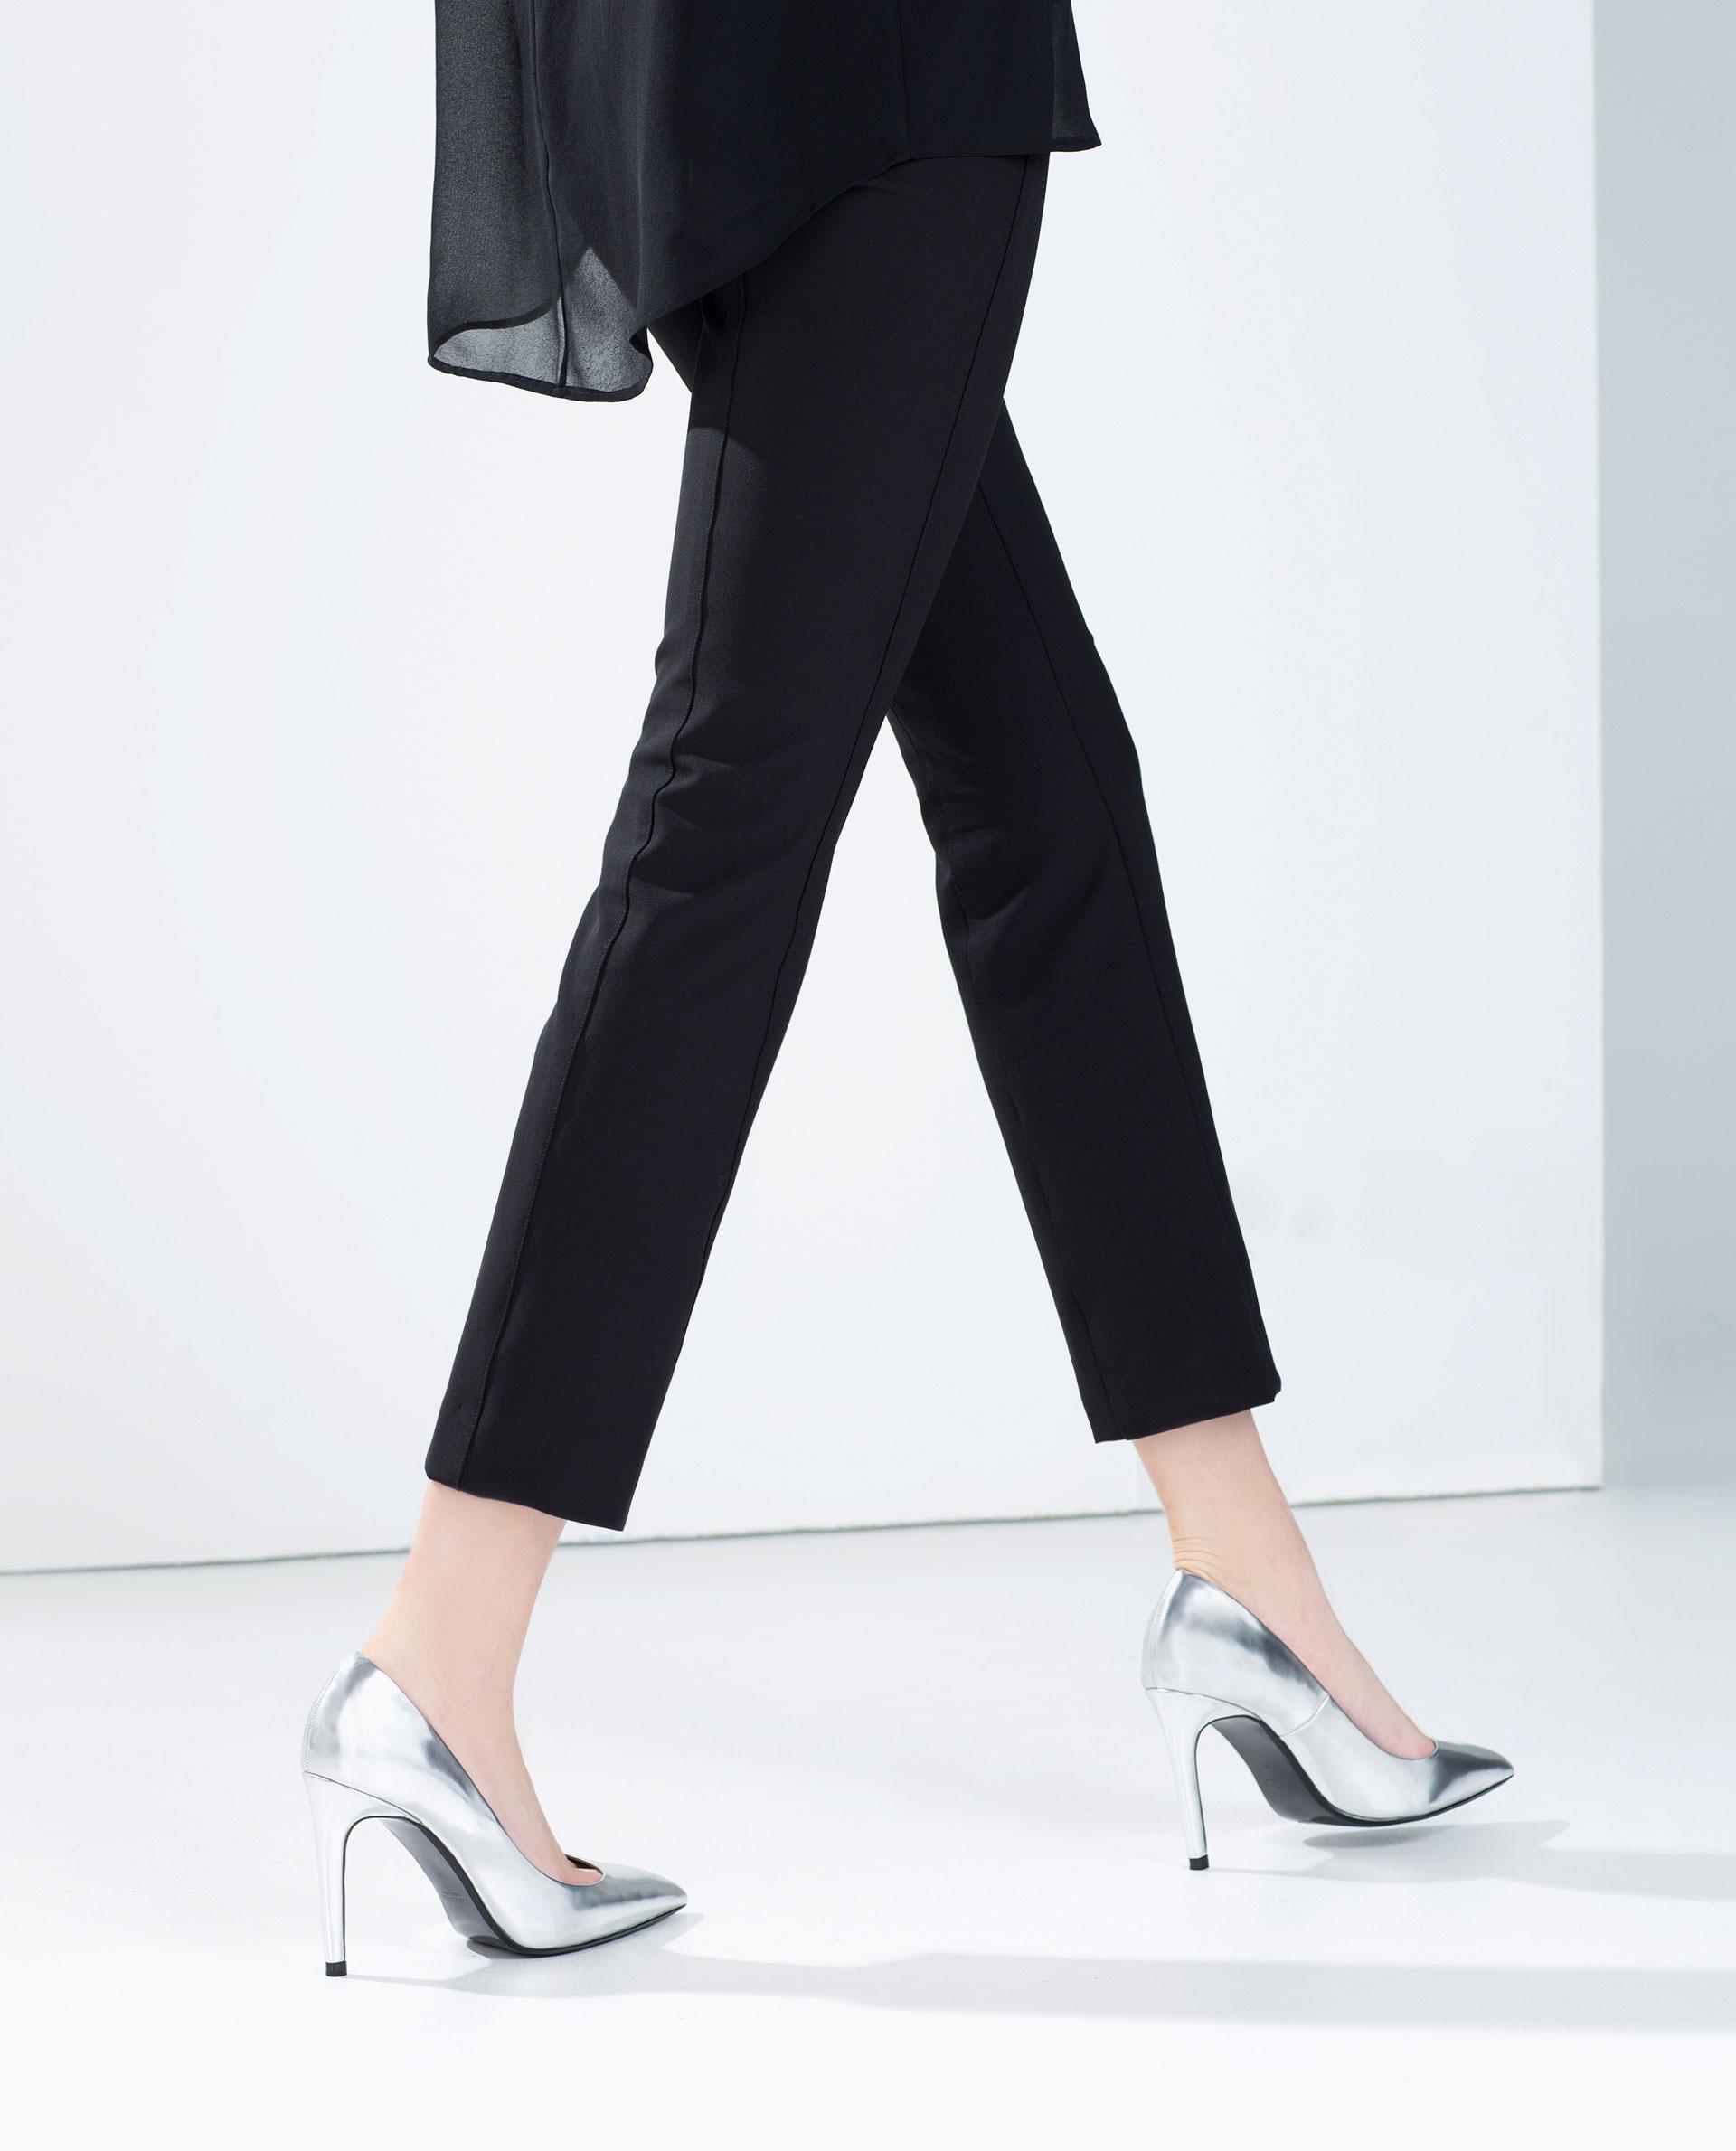 21c66b851f9 LAMINATED HIGH HEEL COURT SHOE - High - heels - Shoes ...